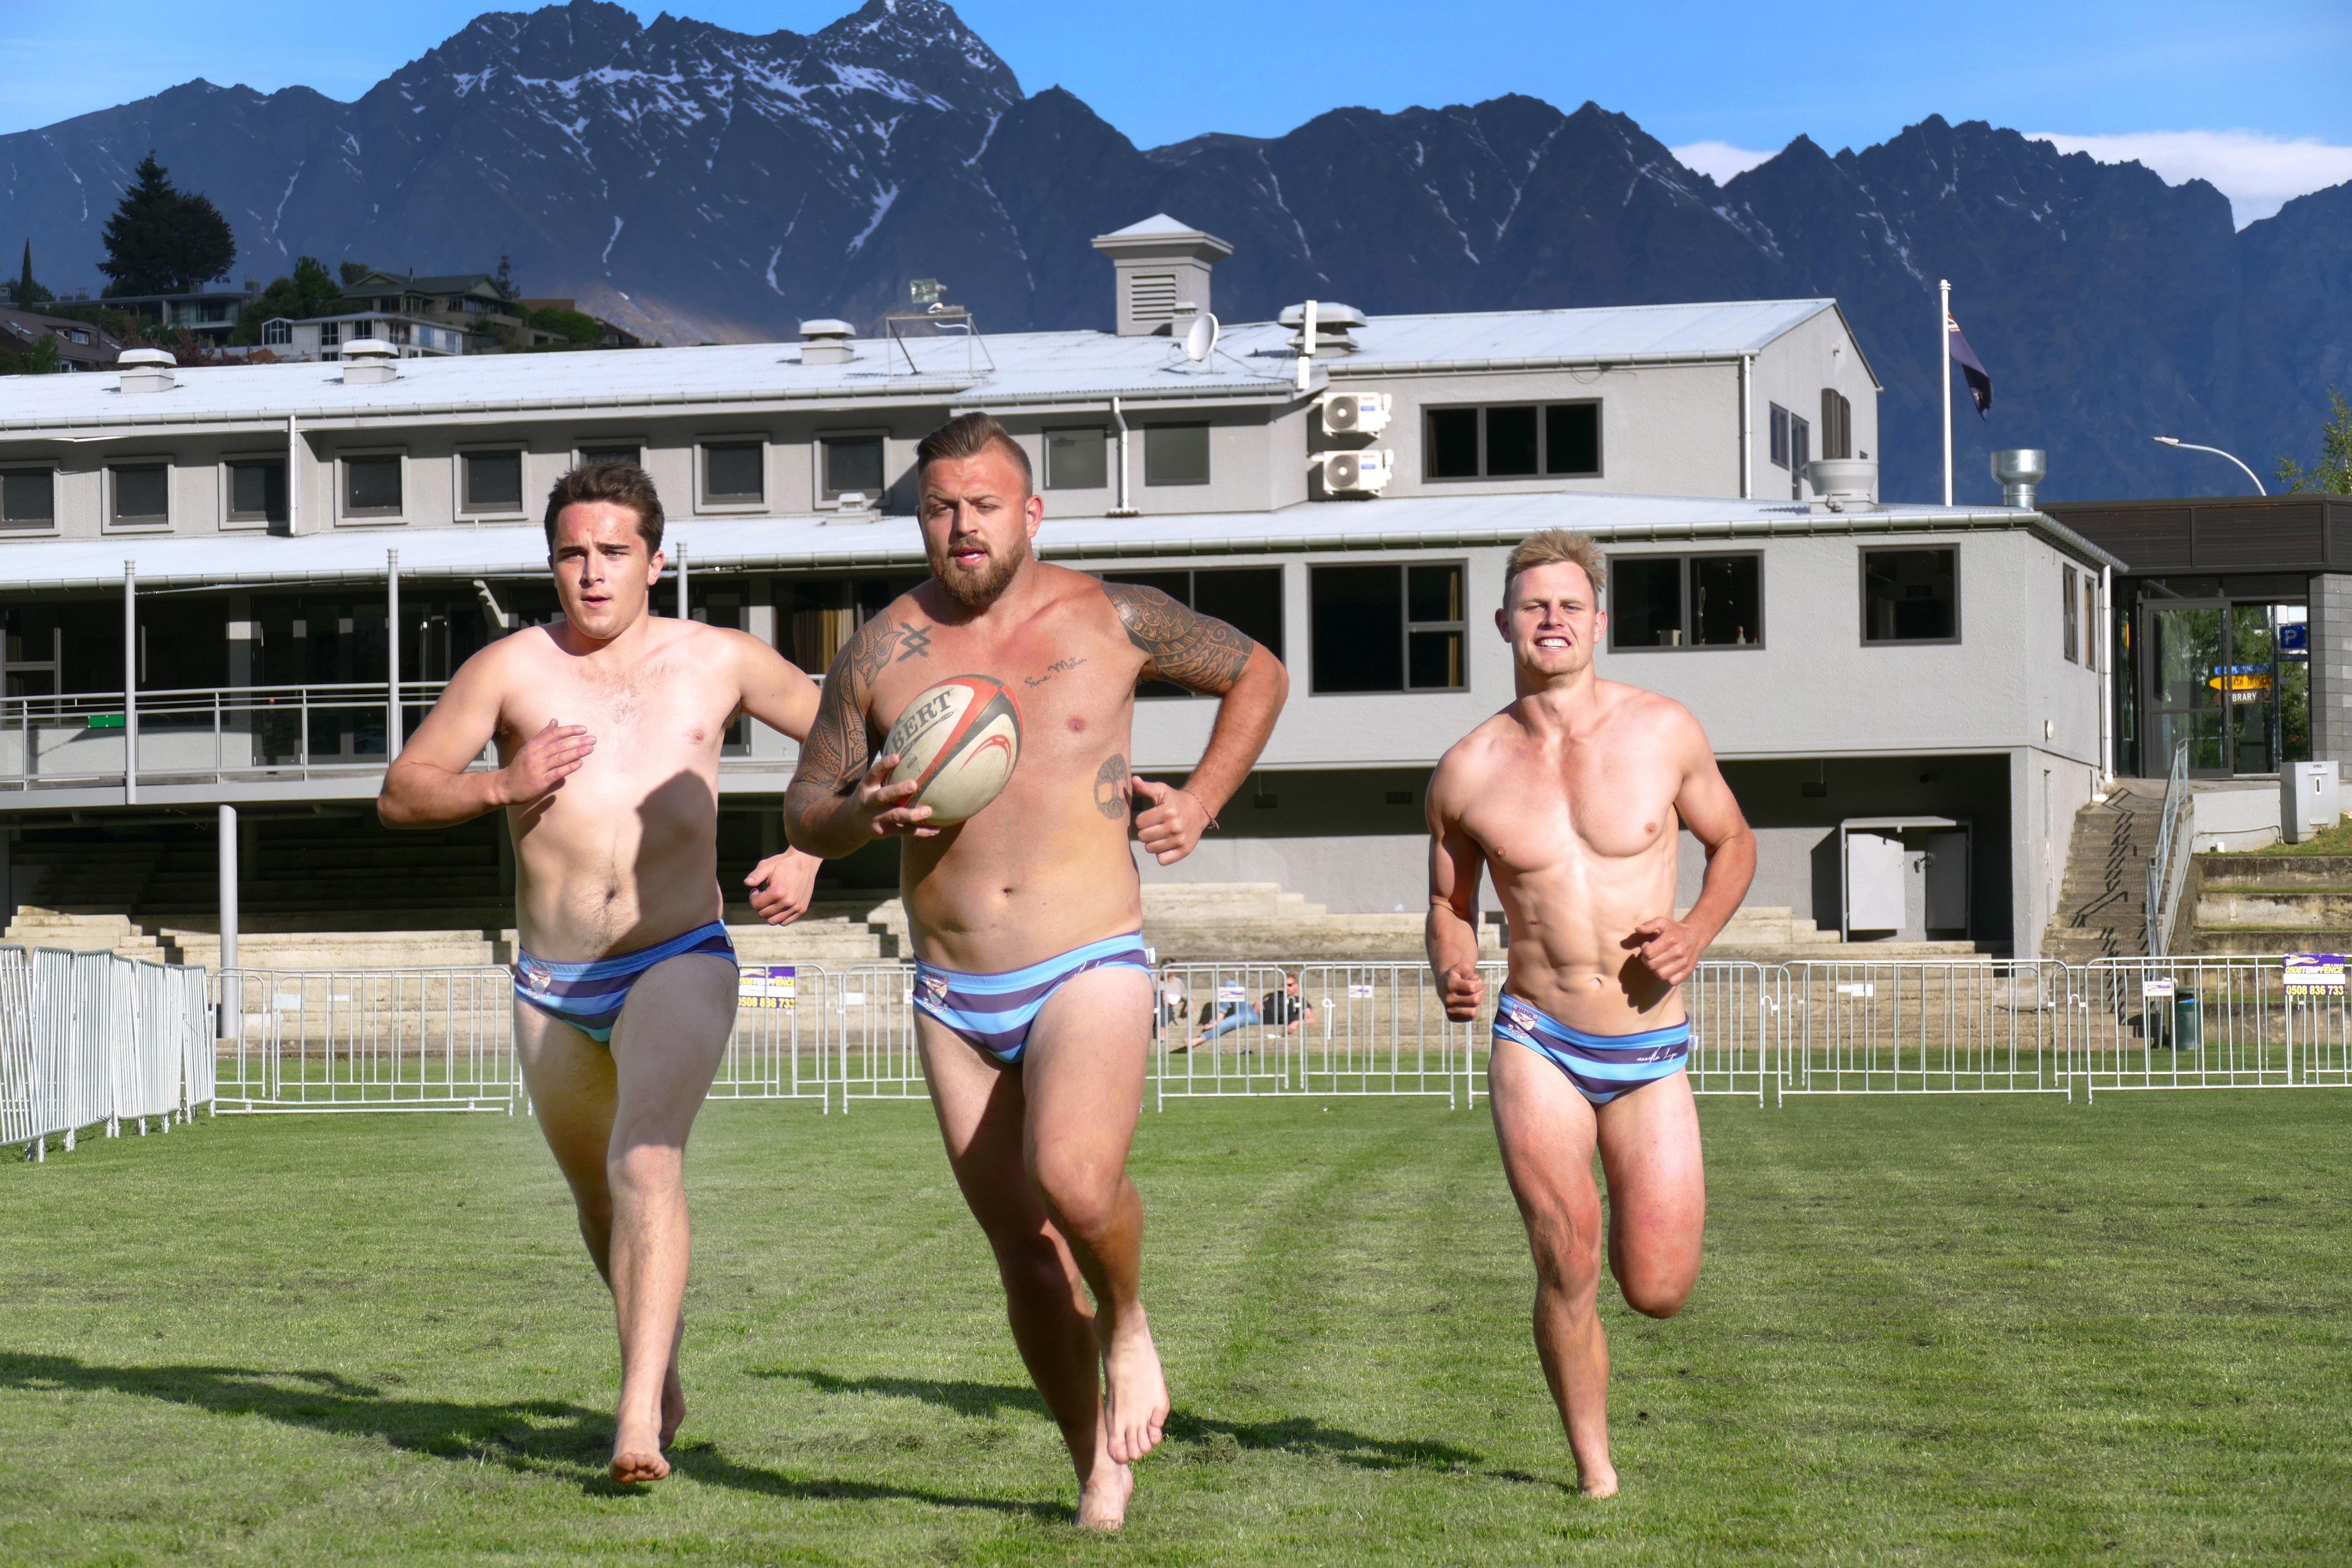 Wakatipu Rugby Club players (from left) Tom Ellis, Rhys Kearton and Logan Beggs stretch their legs before Saturday's Queenstown International Marathon. Photo: Tracey Roxburgh